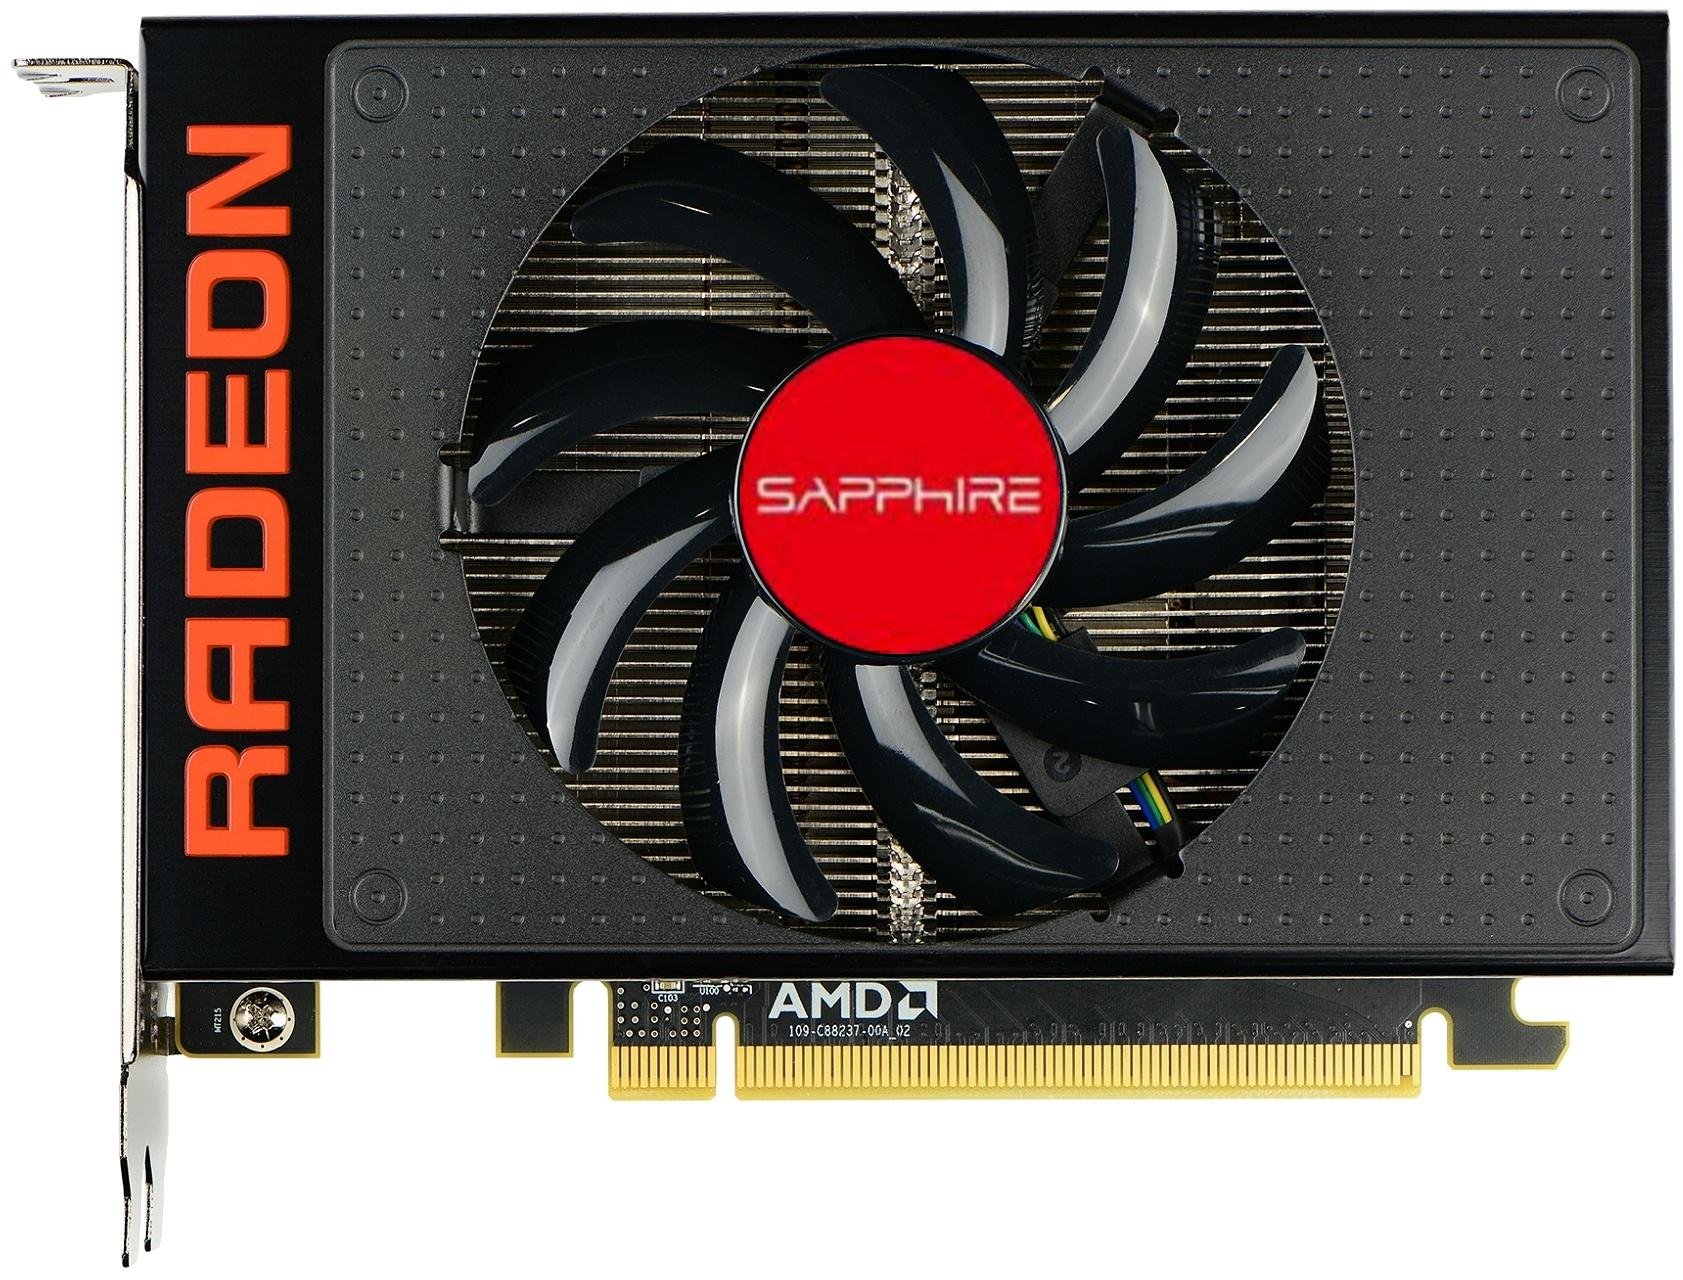 Sapphire R9 Nano